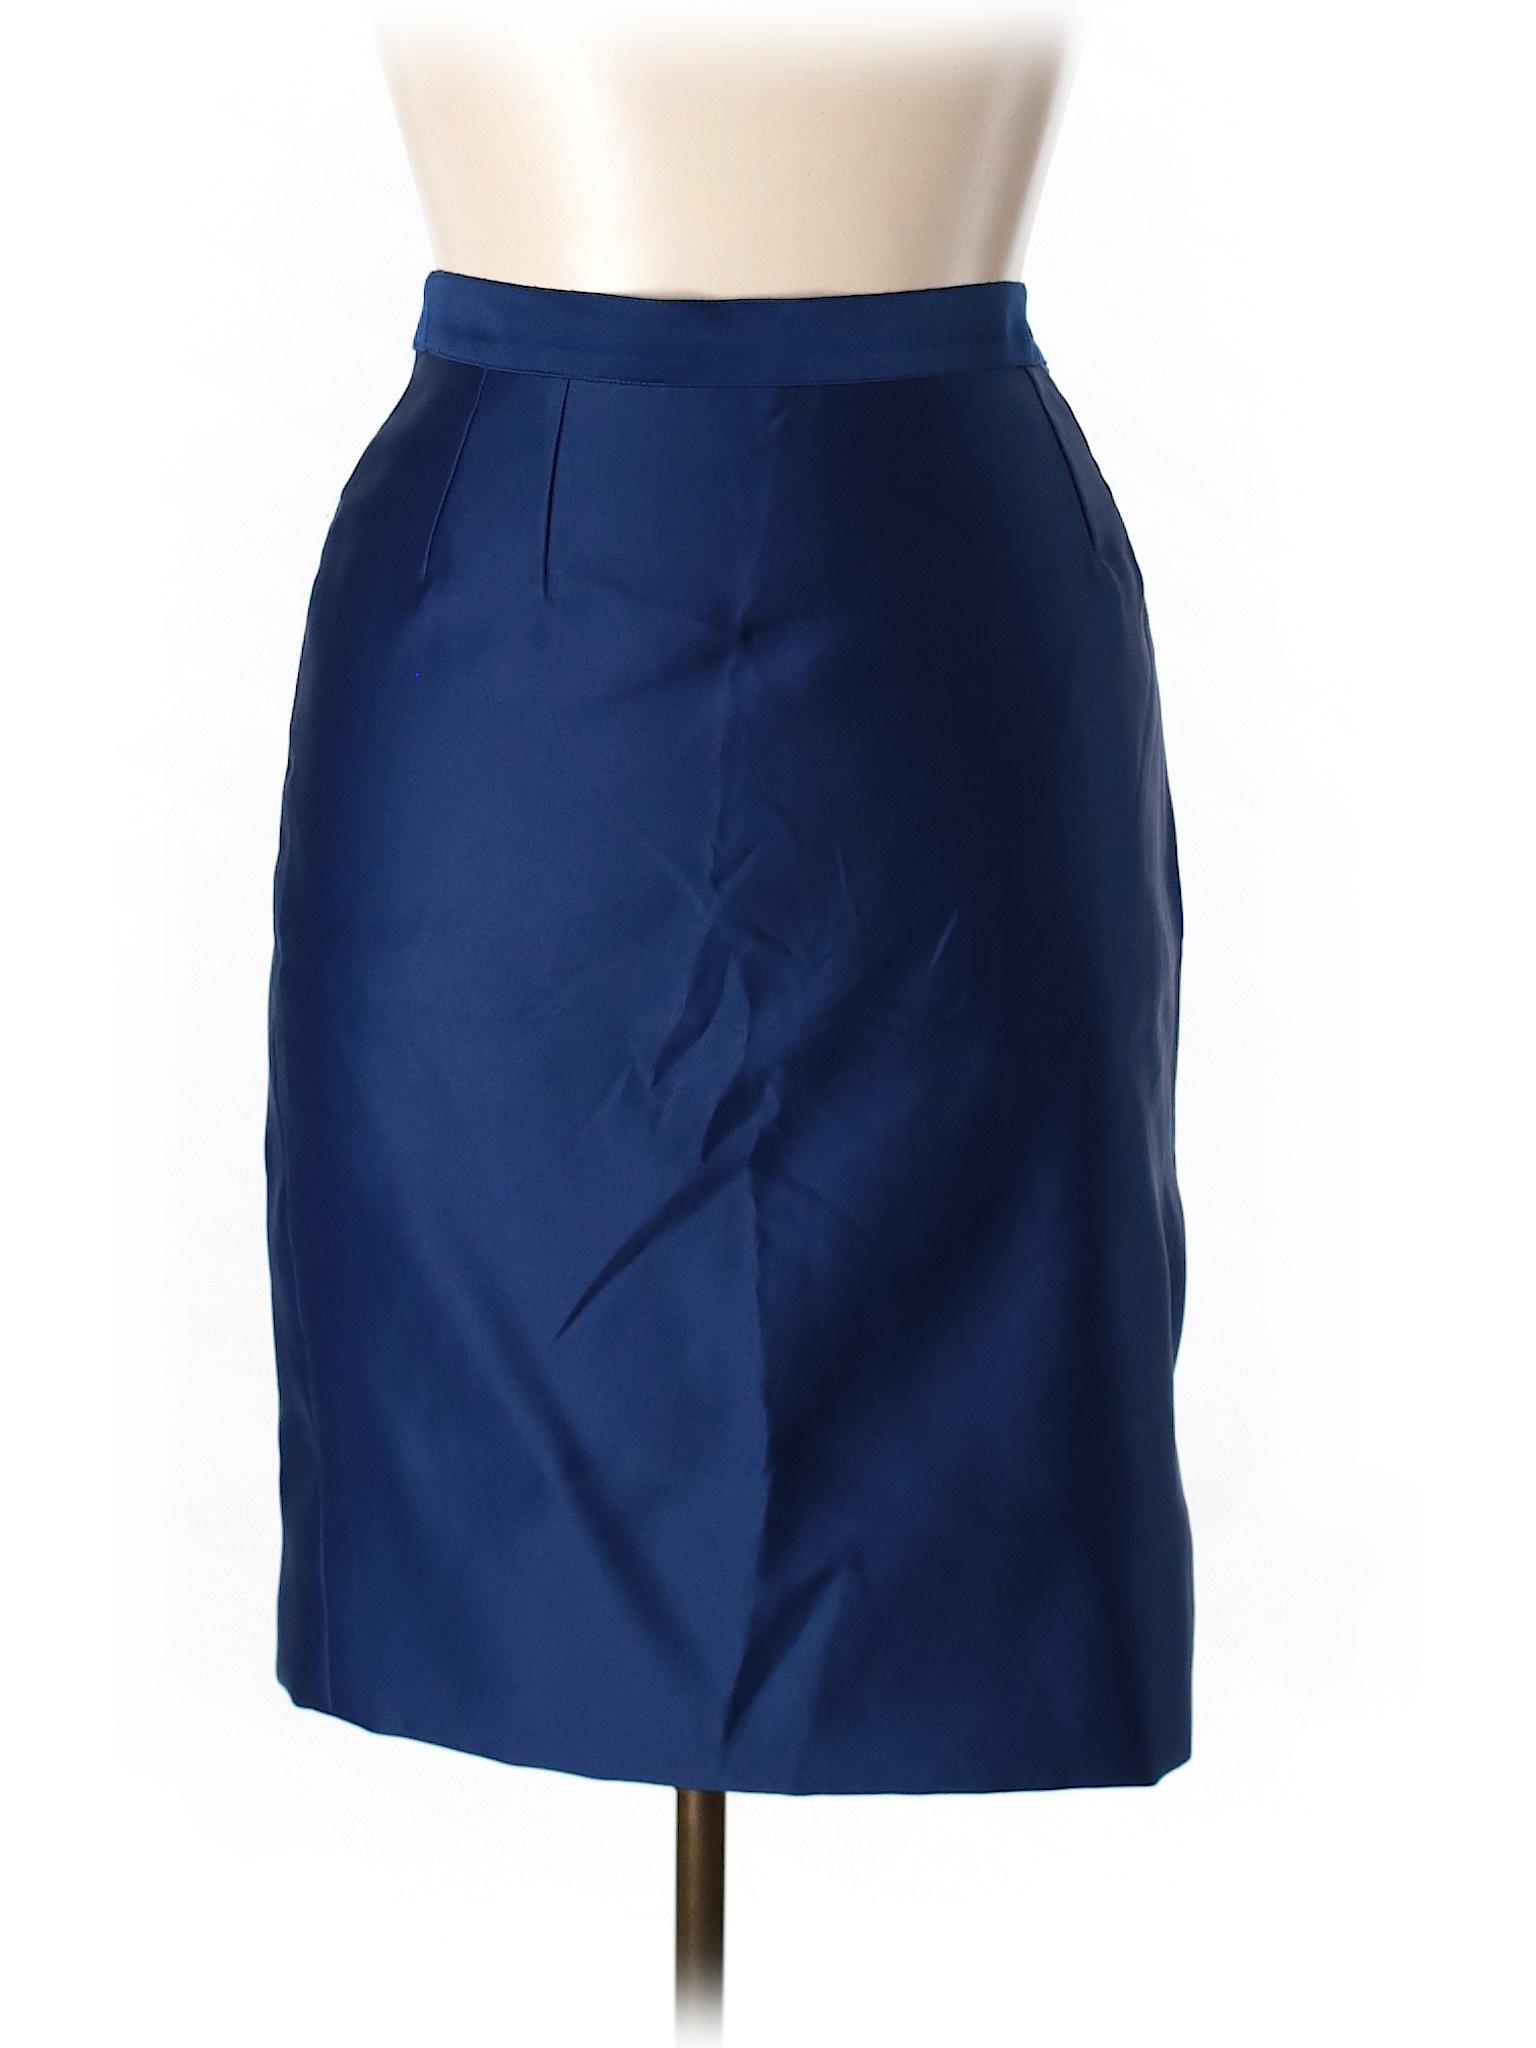 Yves saint laurent casual skirt 97 off only on thredup for Bureau yves saint laurent